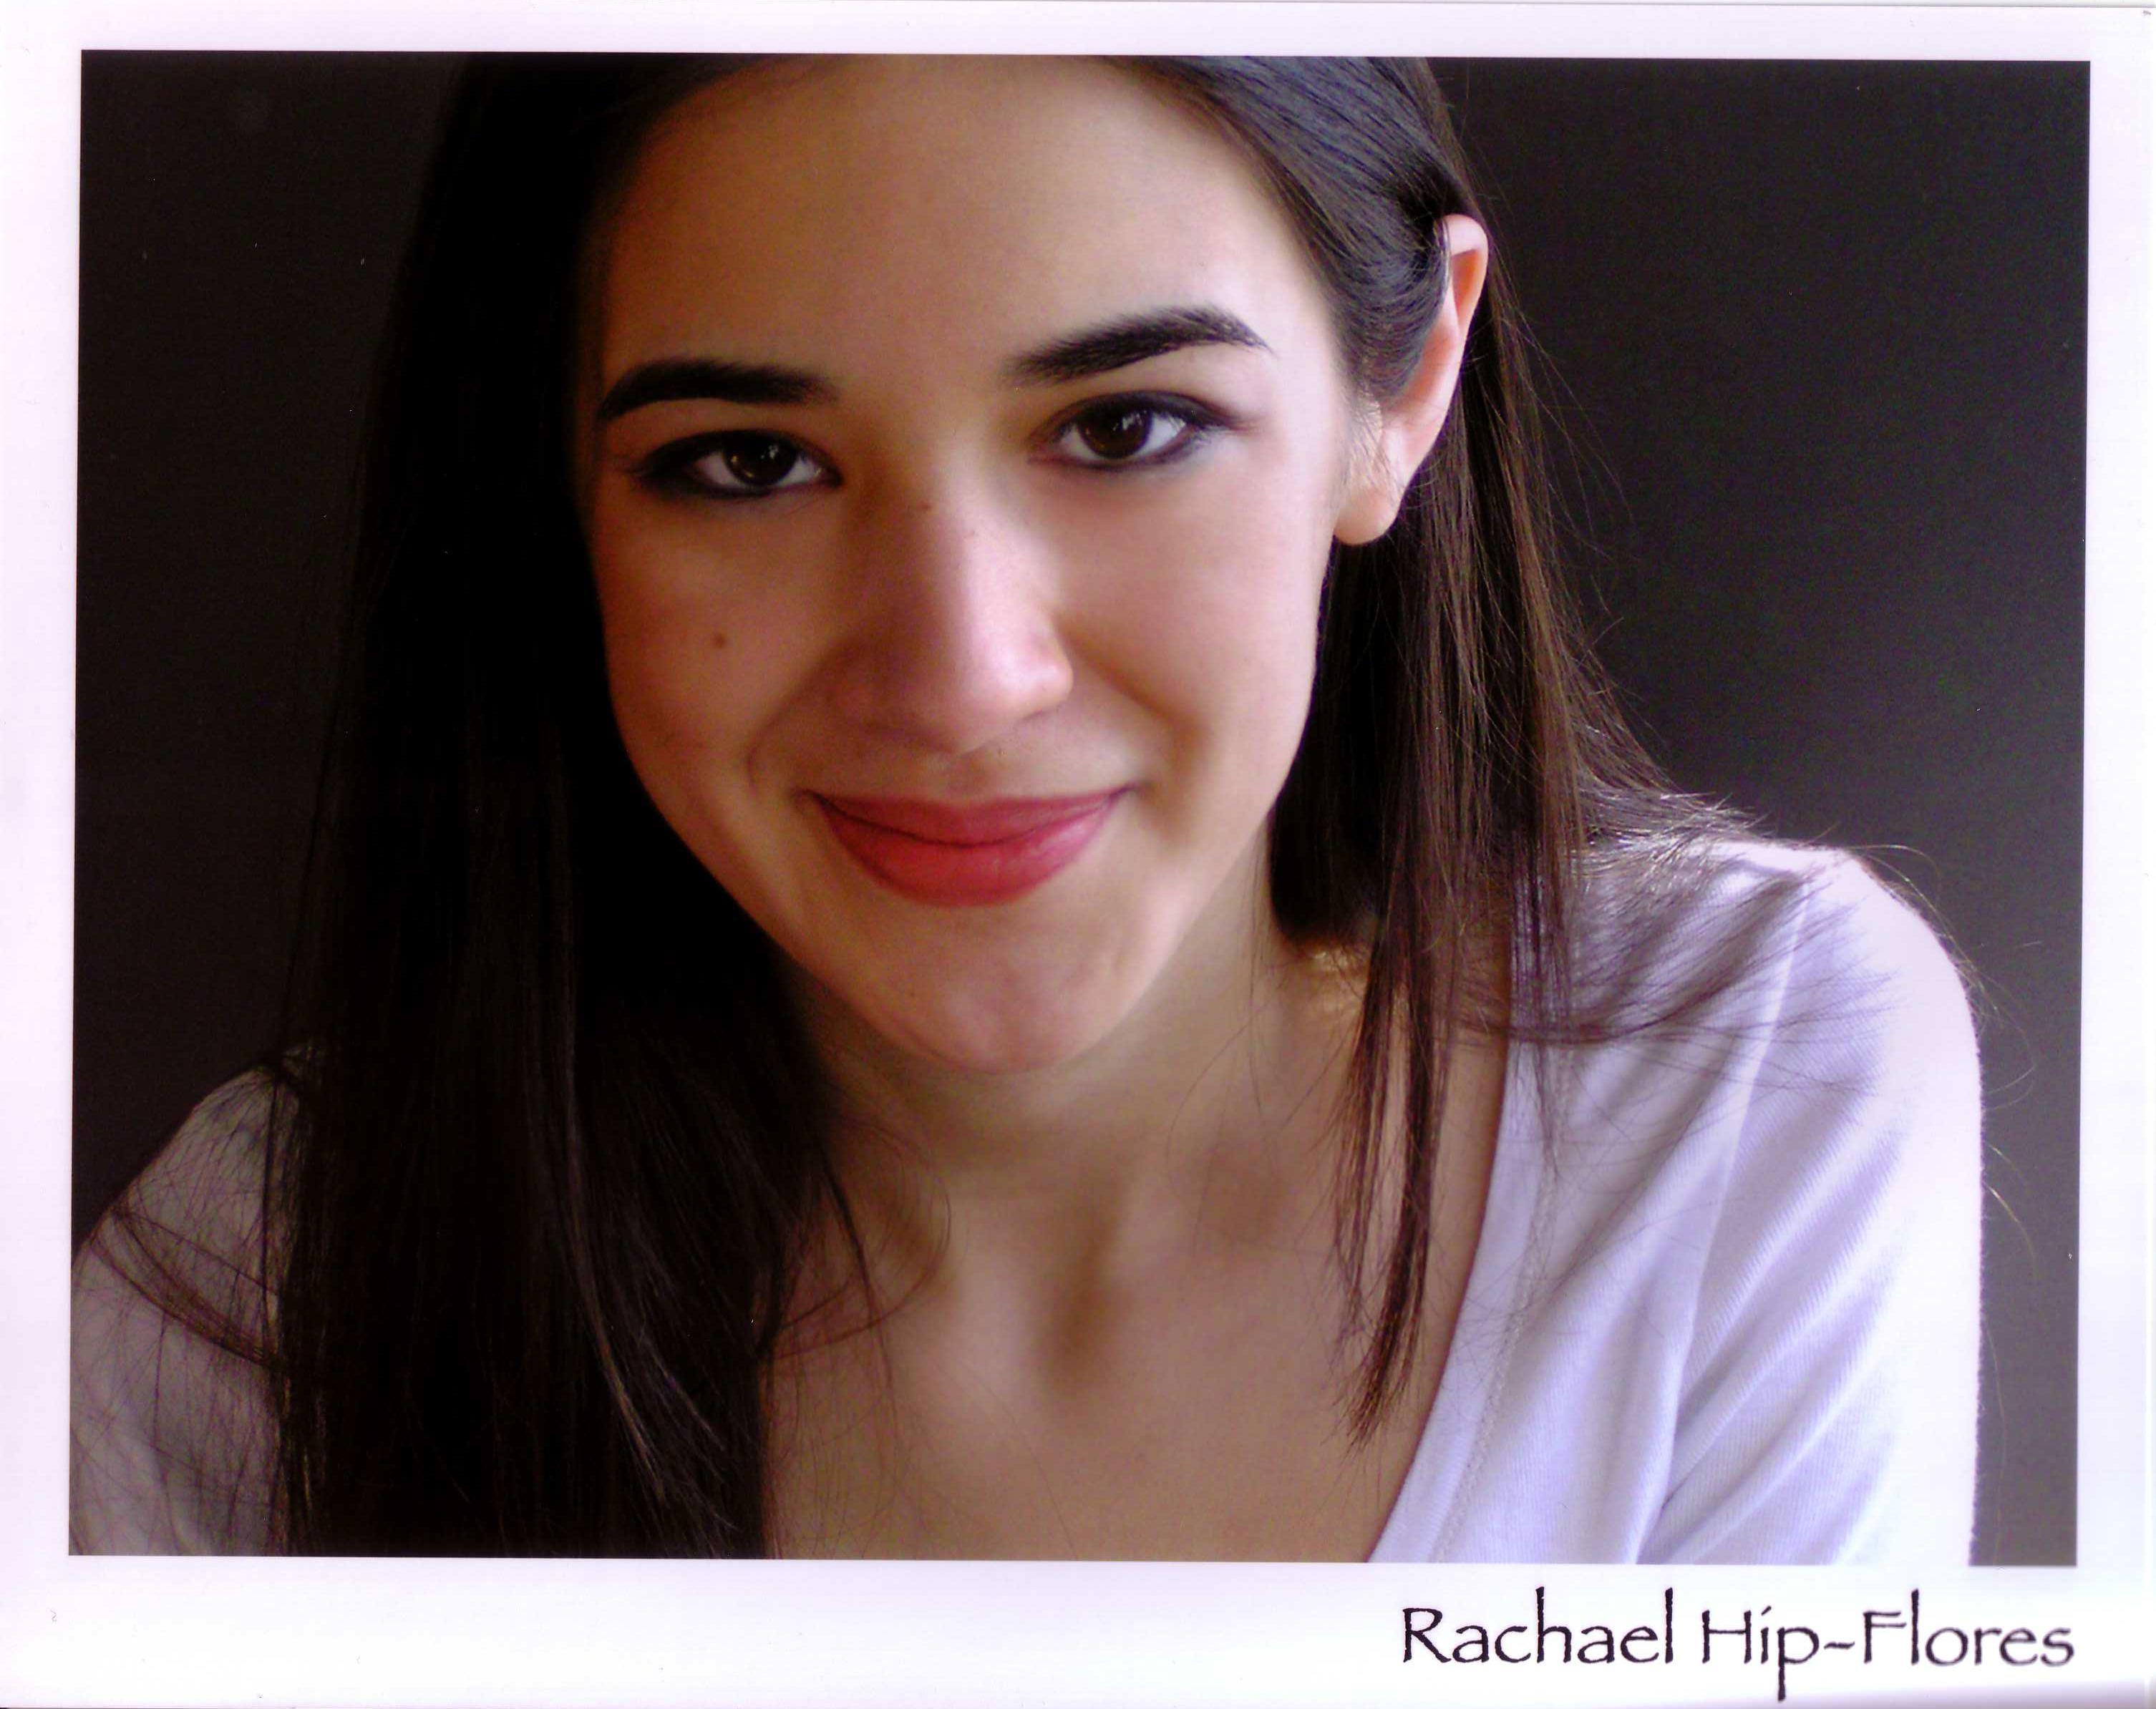 Rachael Hip-Flores